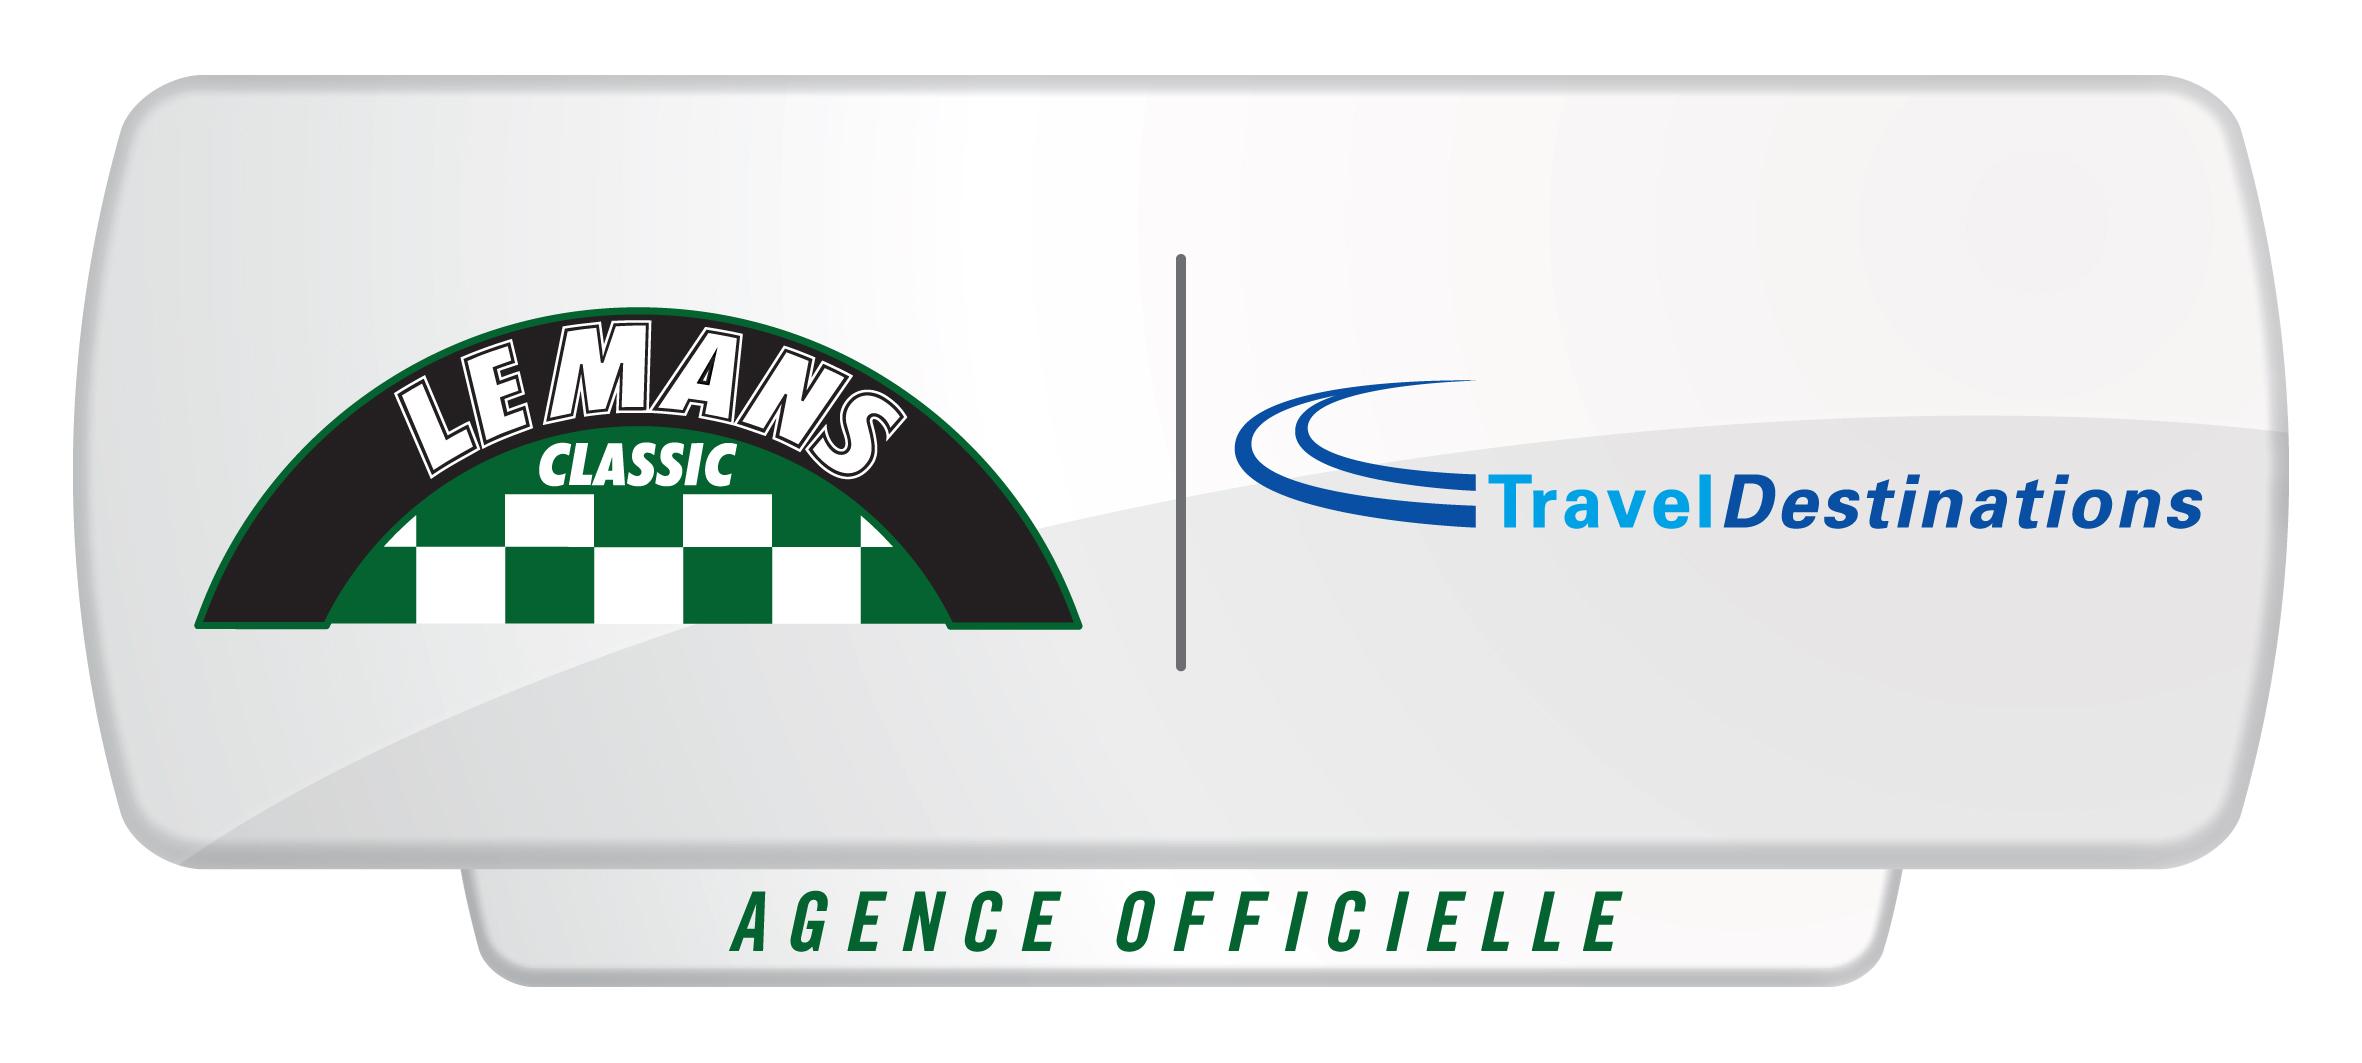 Le Mans Classic official ticket agent